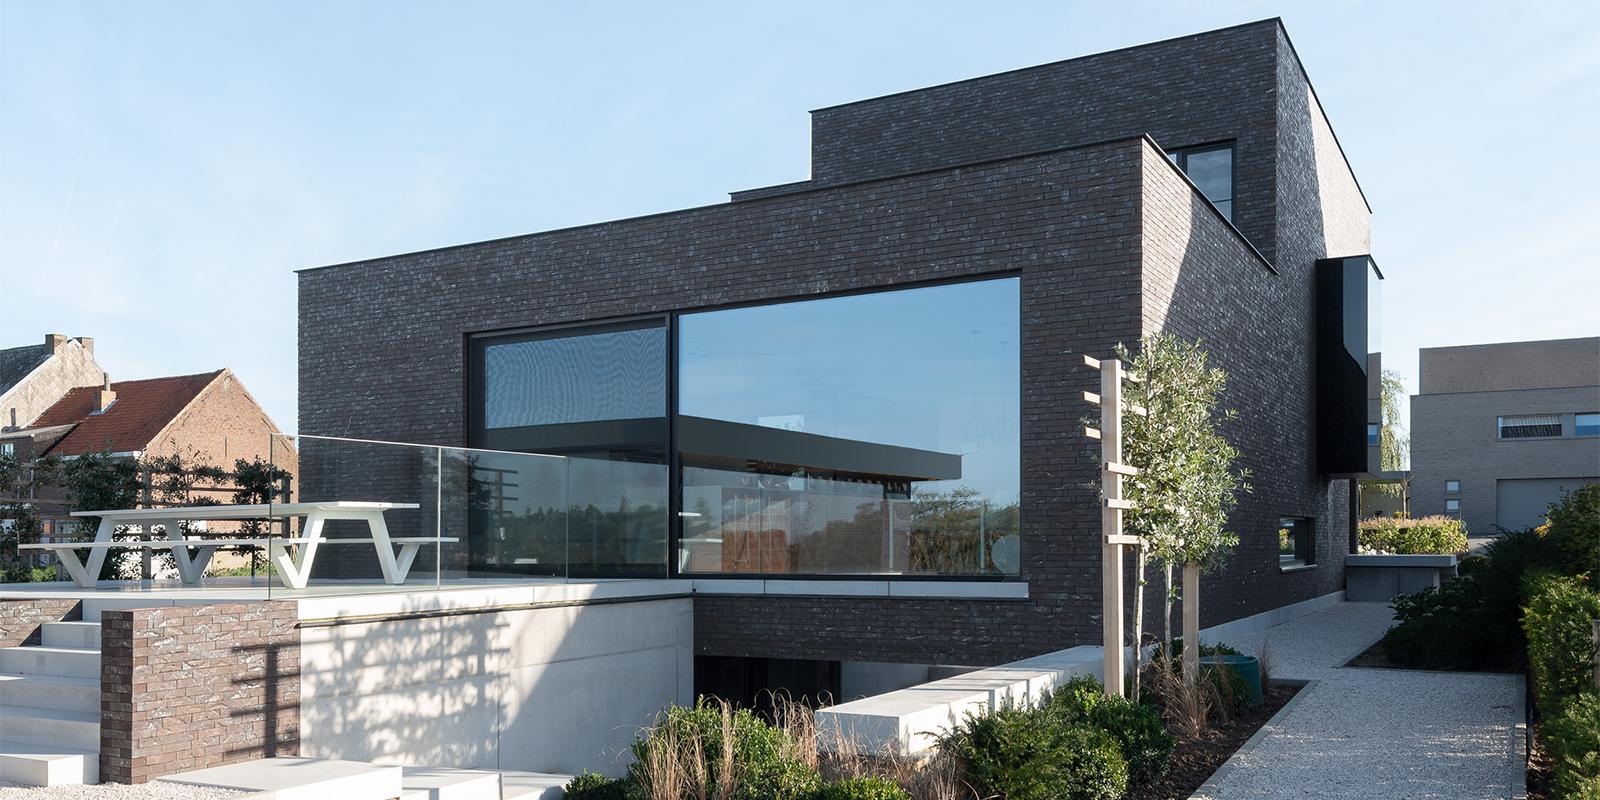 Thomas De Gier, Stadsvilla, Contrast, Strak, Modern, Interieur